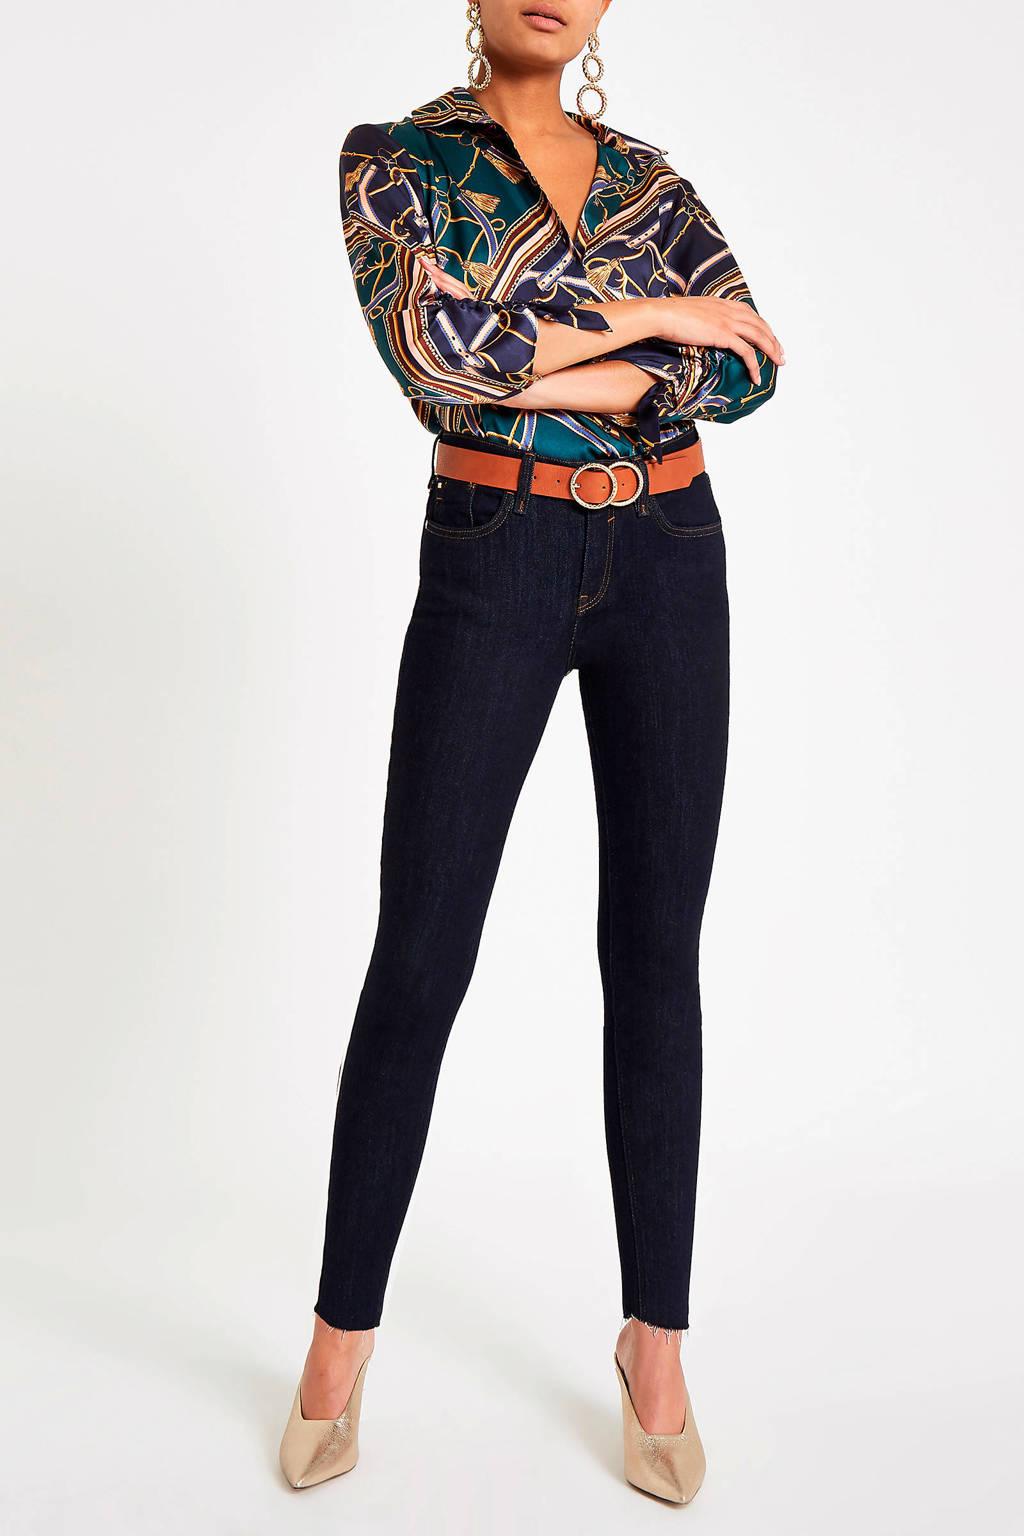 River Island blouse met all over print, Groen/ blauw/ bruin